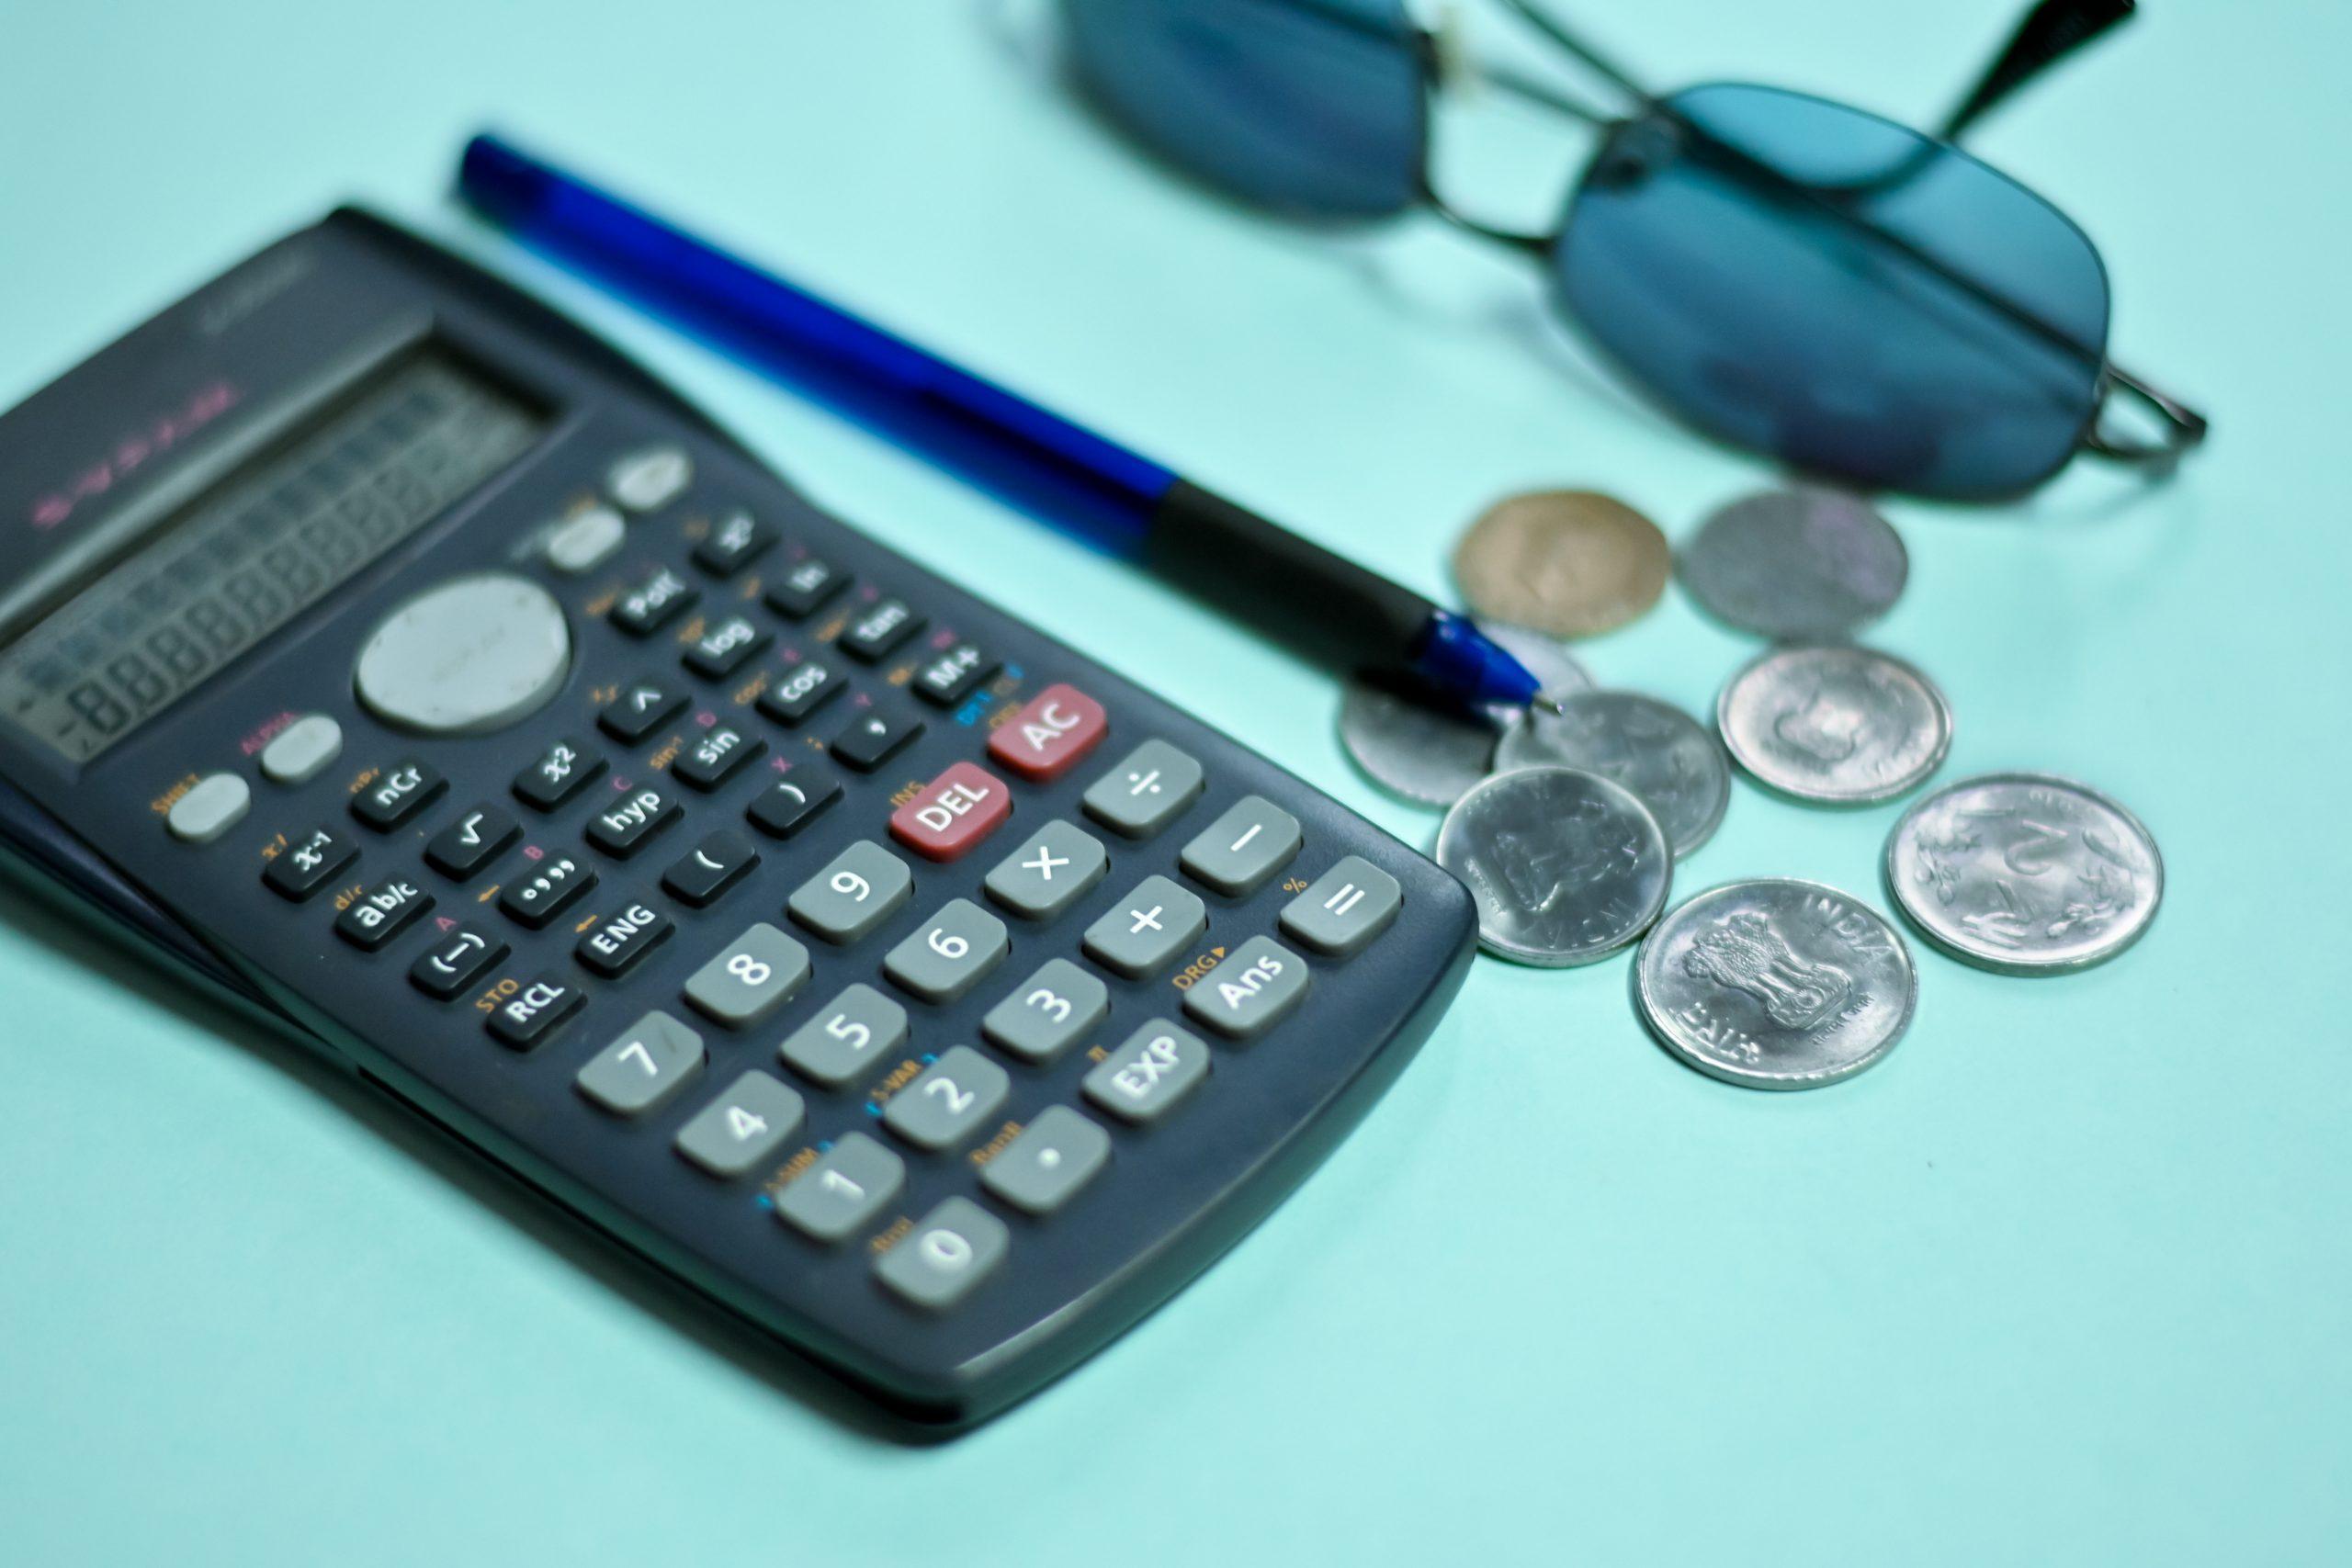 A scientific calculator for accounting